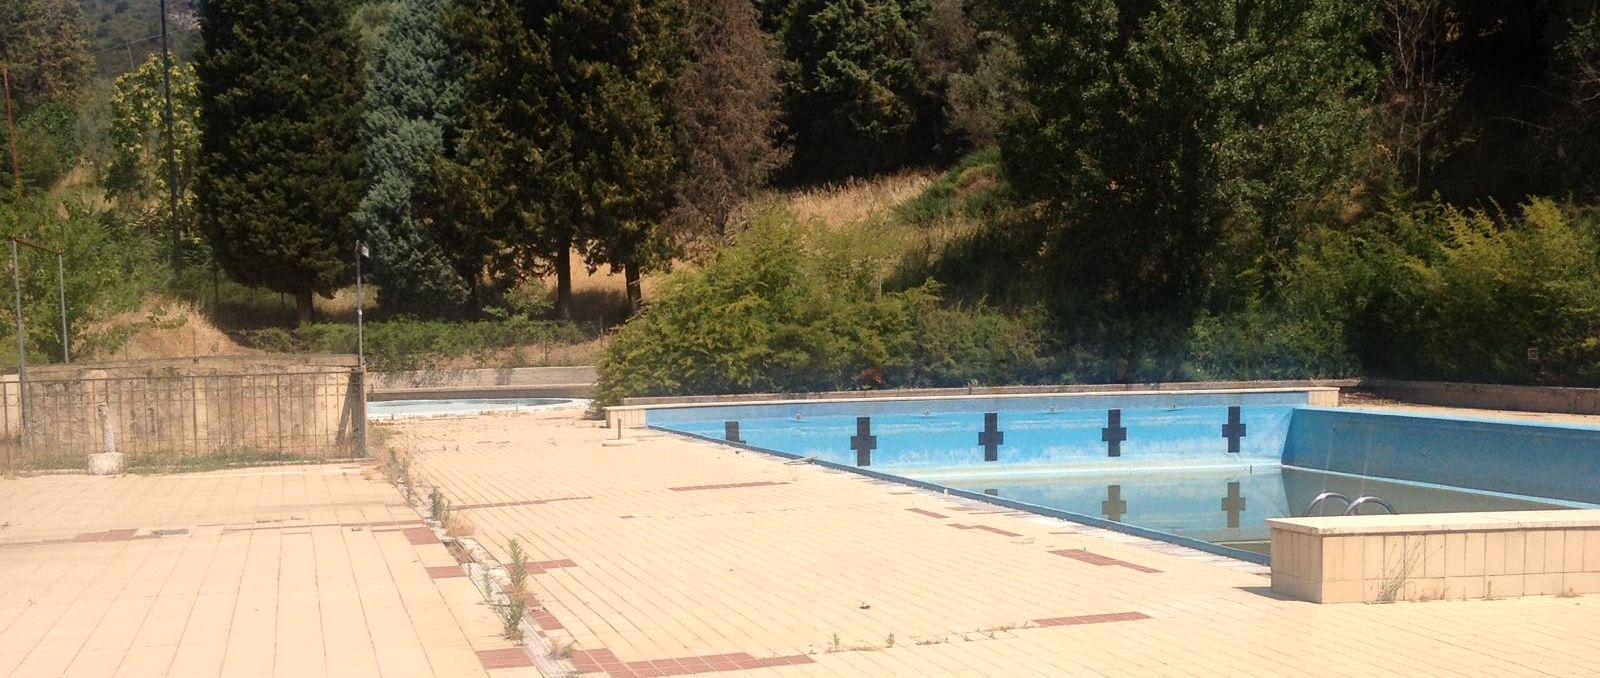 Umbria ferentillo l estate senza piscina sportpolitics - Piscina chiusa sclafani ...